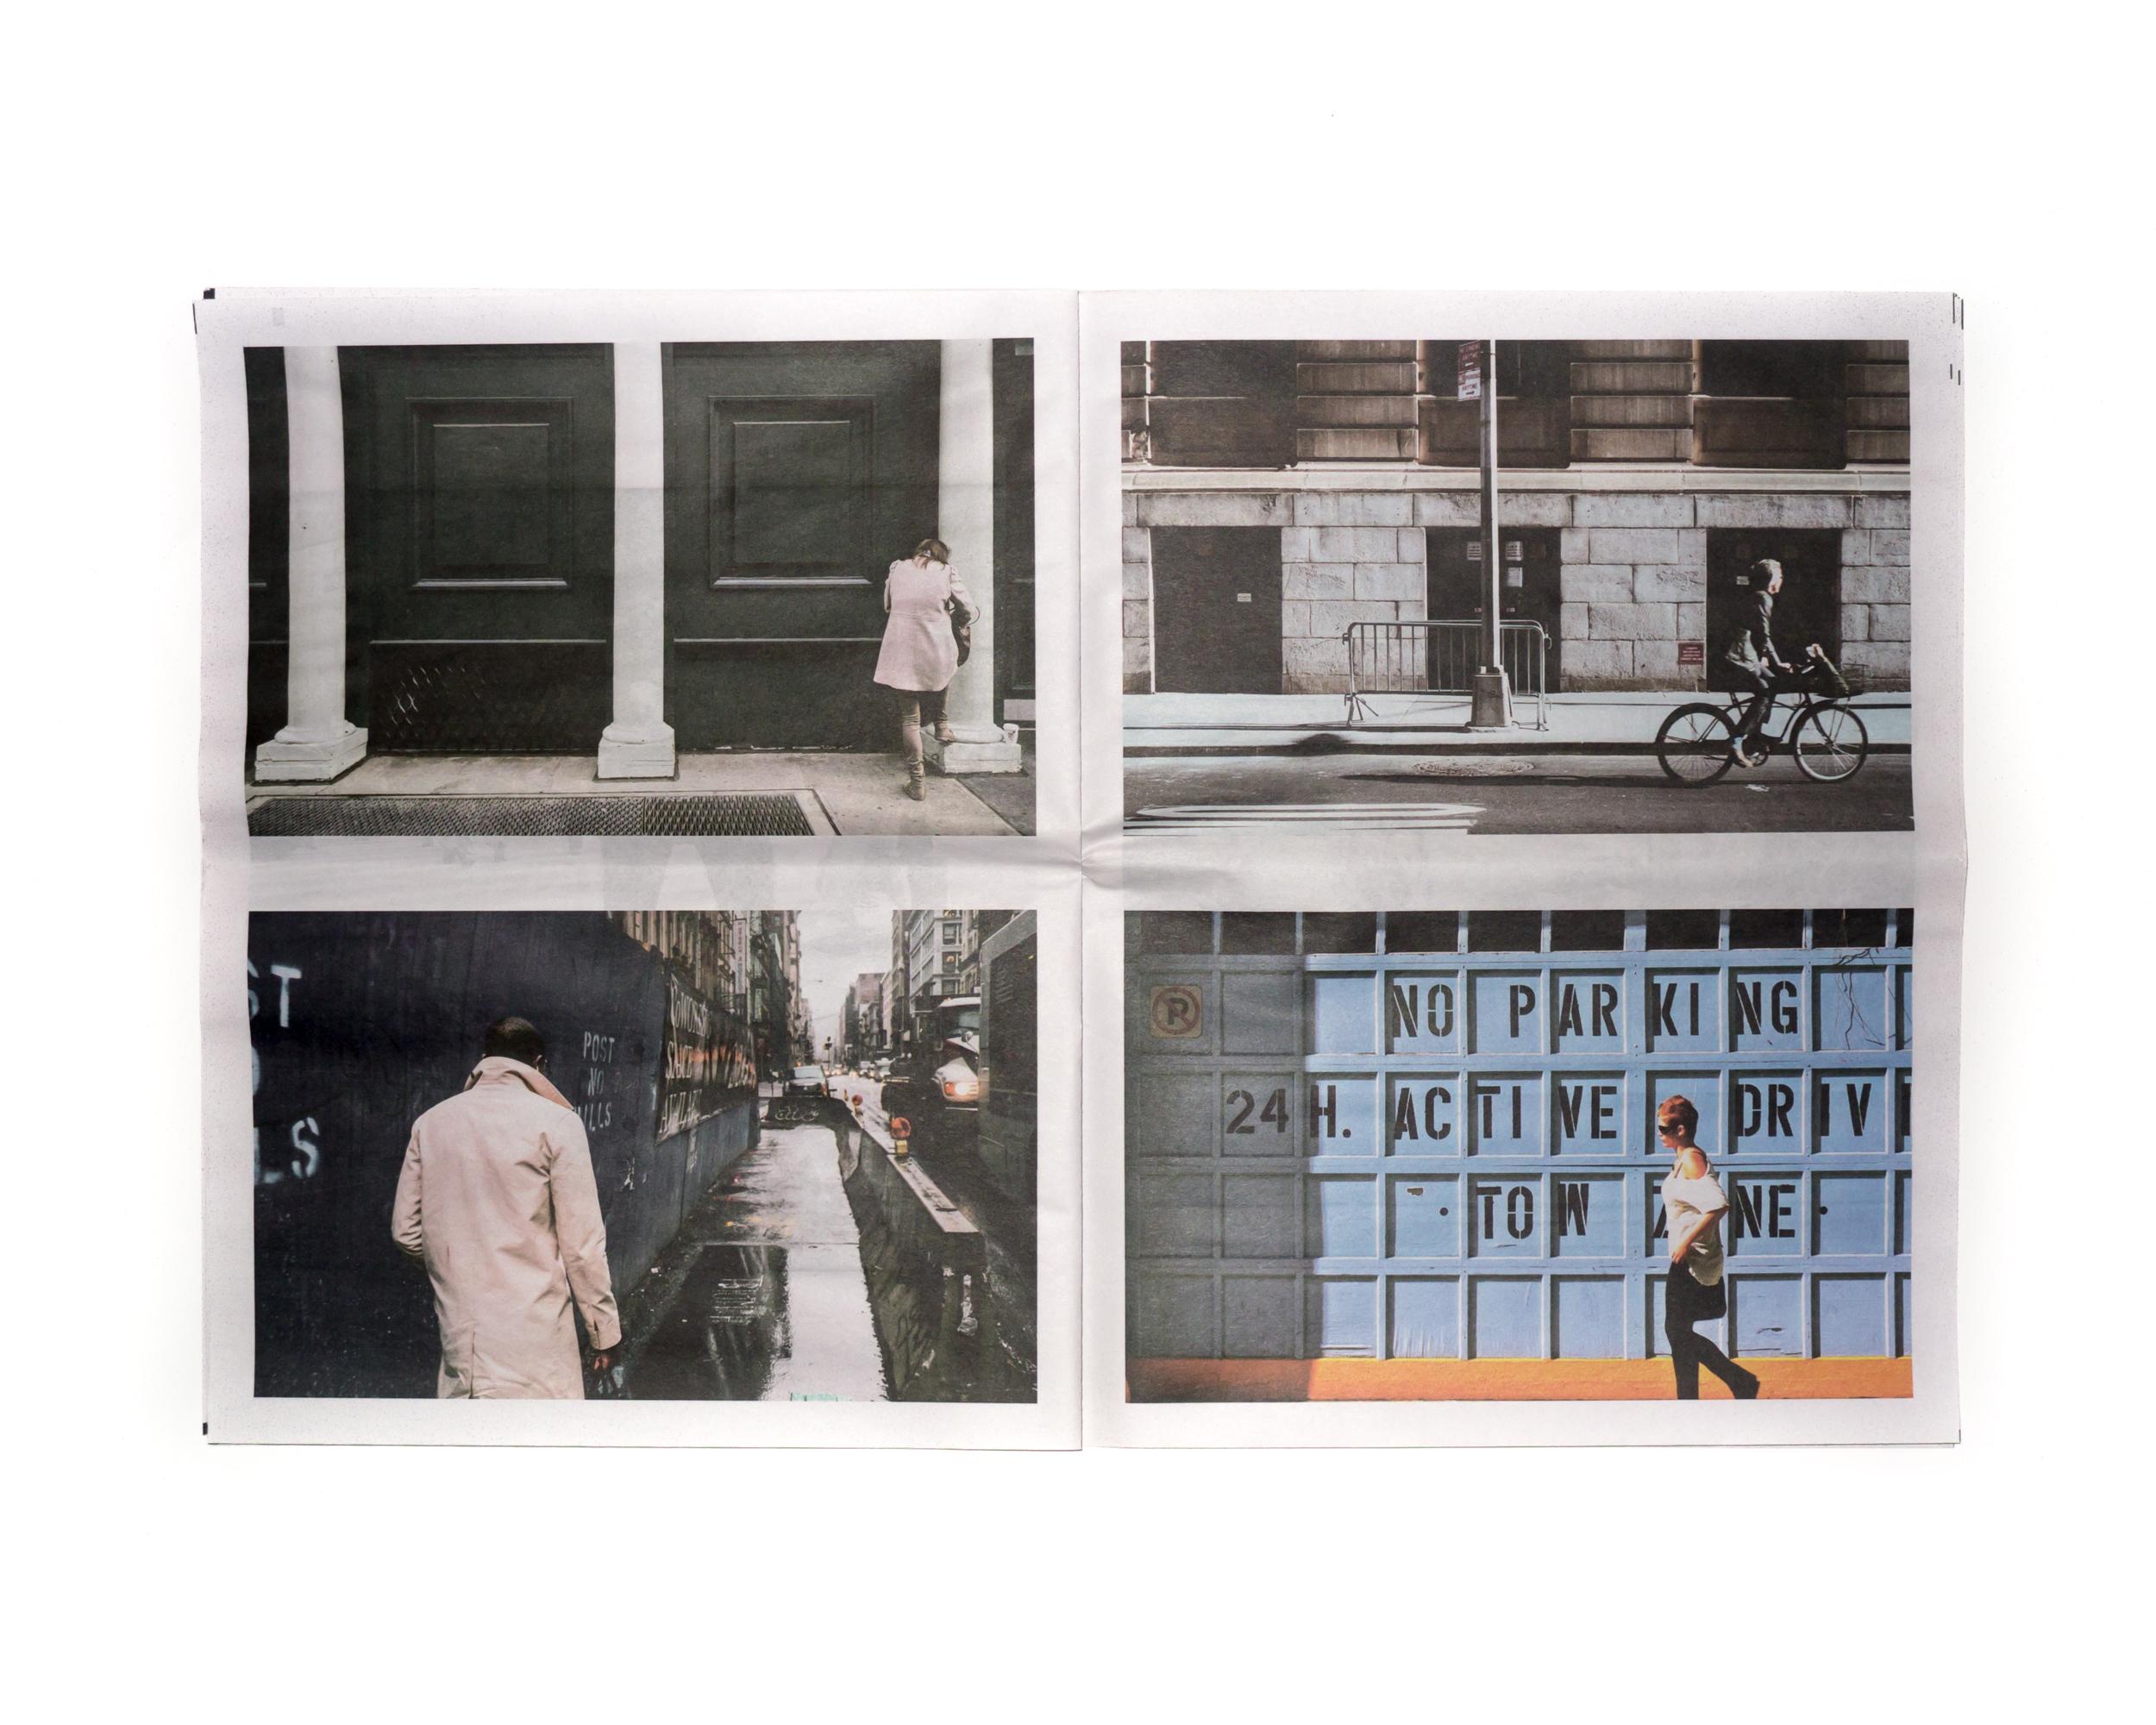 grit-street-01-newsprint-promo-5.jpg